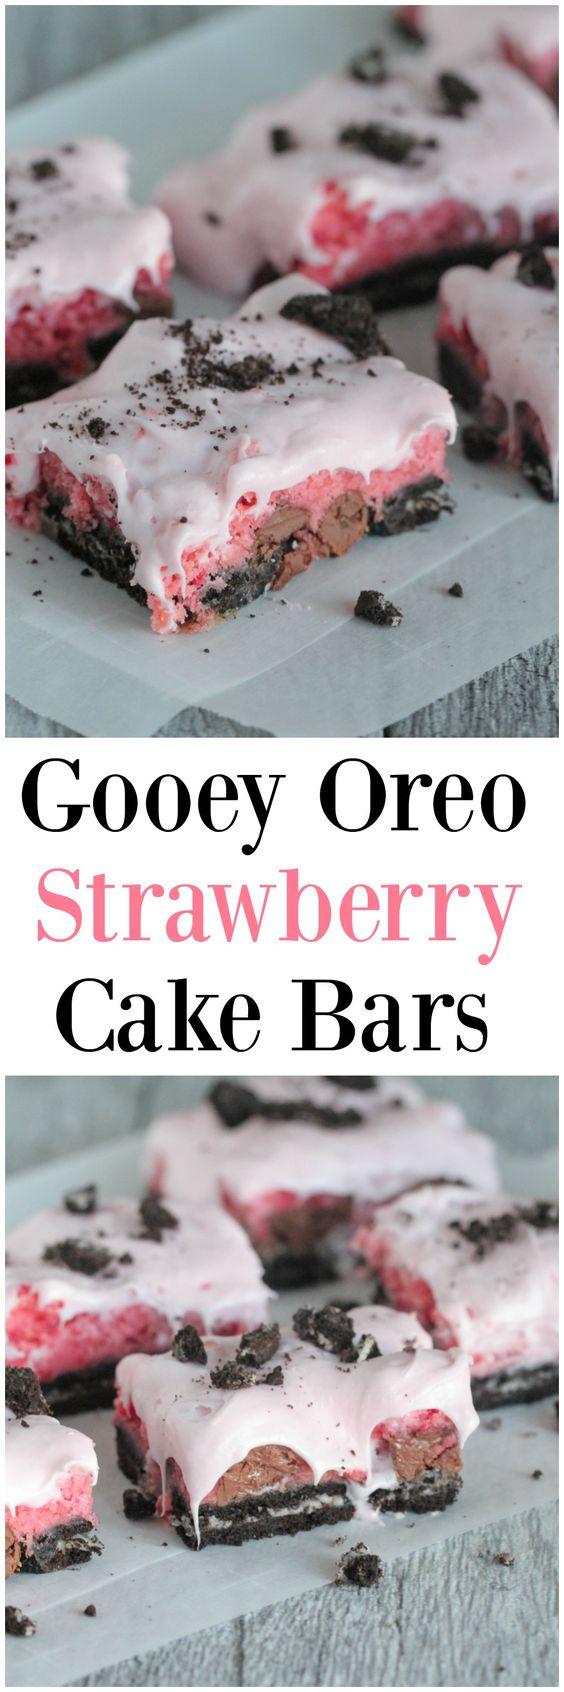 Gooey Oreo Strawberry Cake Bars ~ Picky Palate